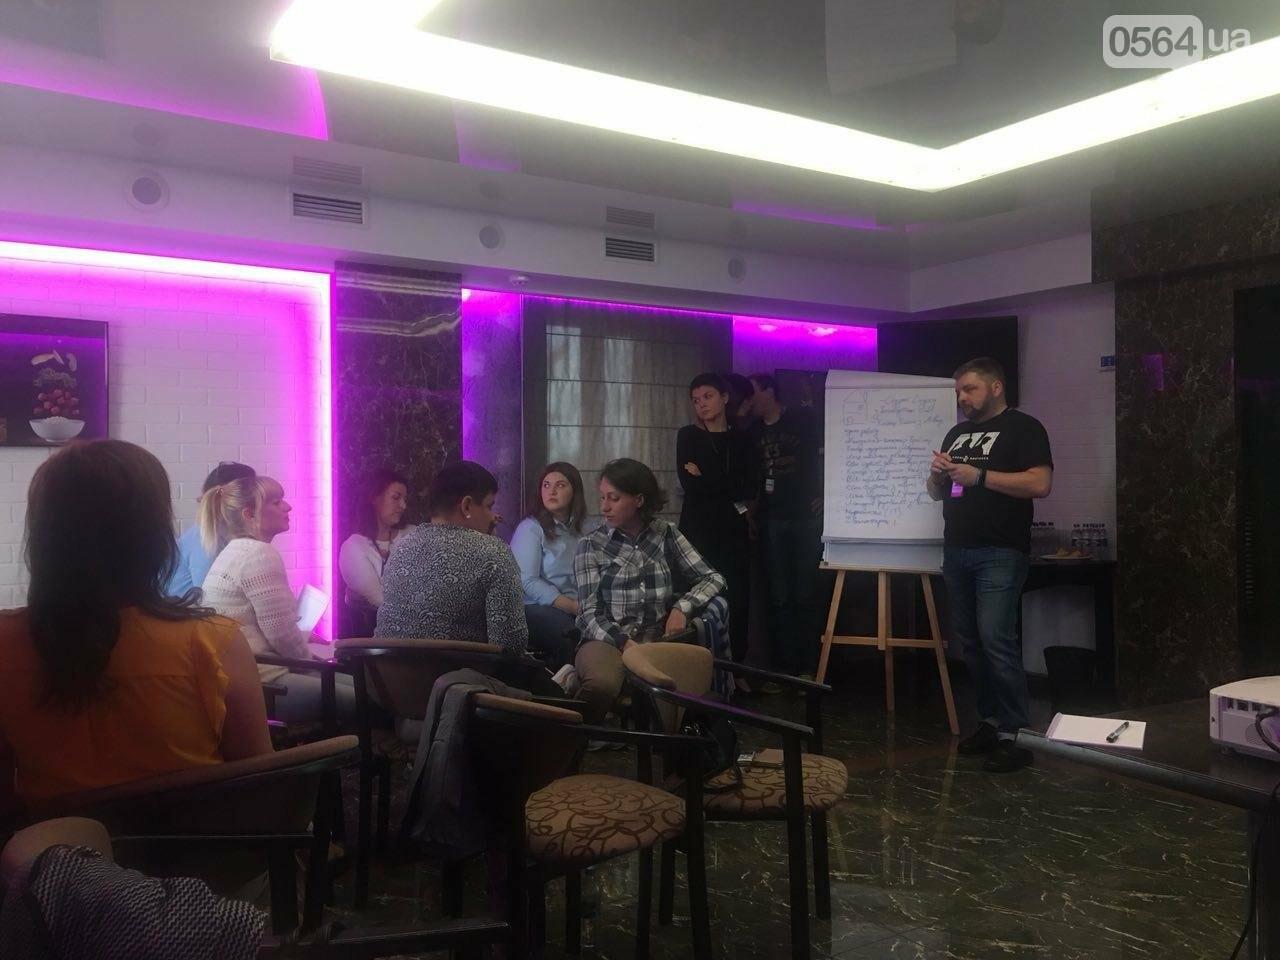 На тренинге о ВИЧ и медреформе криворожским журналистам рассказали о дискриминации и стереотипах, - ФОТО , фото-10